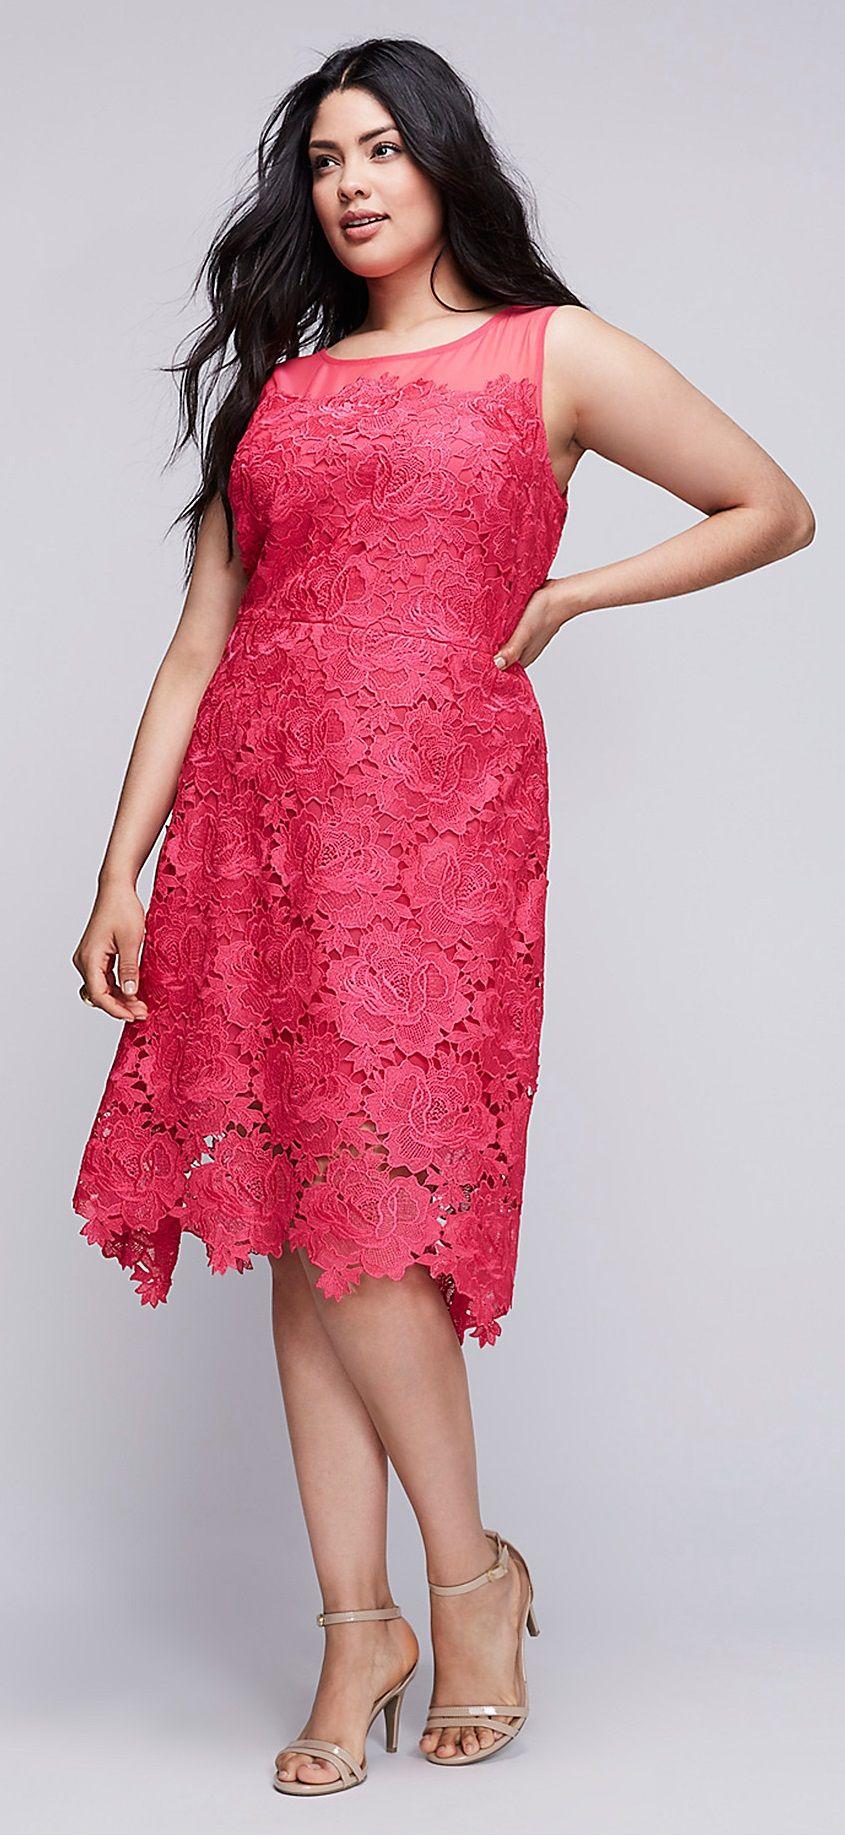 Plus Size Lace Dress | DRESS | Pinterest | Vestidos cortos, Mujeres ...